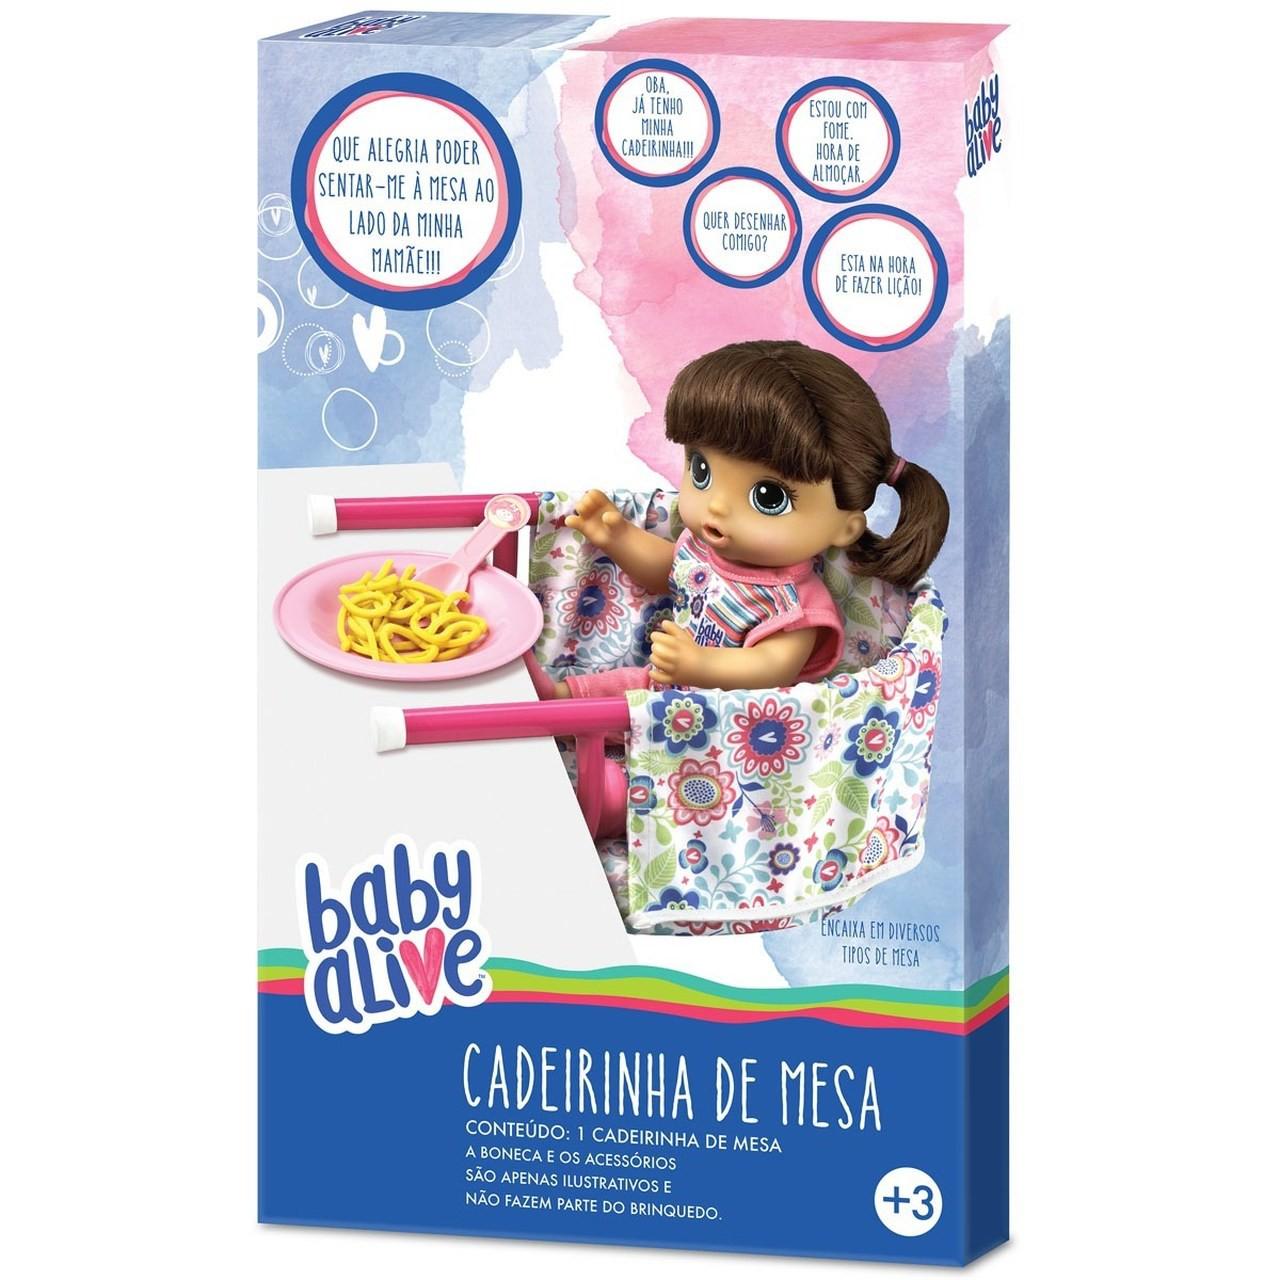 Cadeirinha De Mesa Para Baby Alive - Hasbro